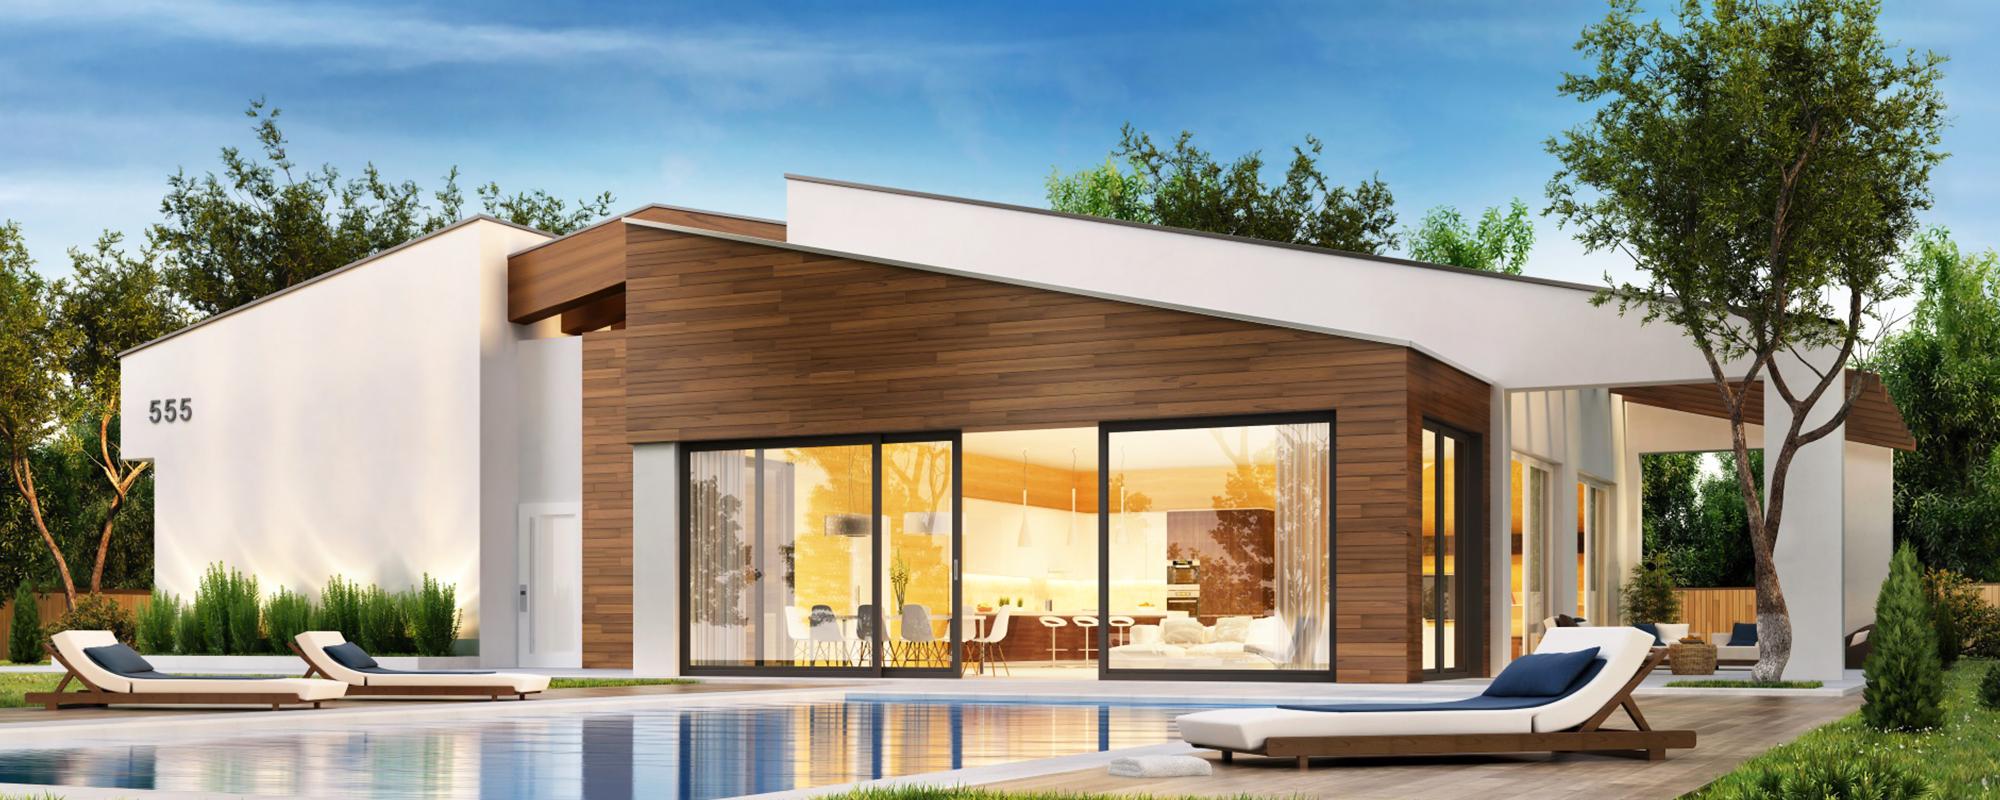 menni international energies services notre expertise. Black Bedroom Furniture Sets. Home Design Ideas